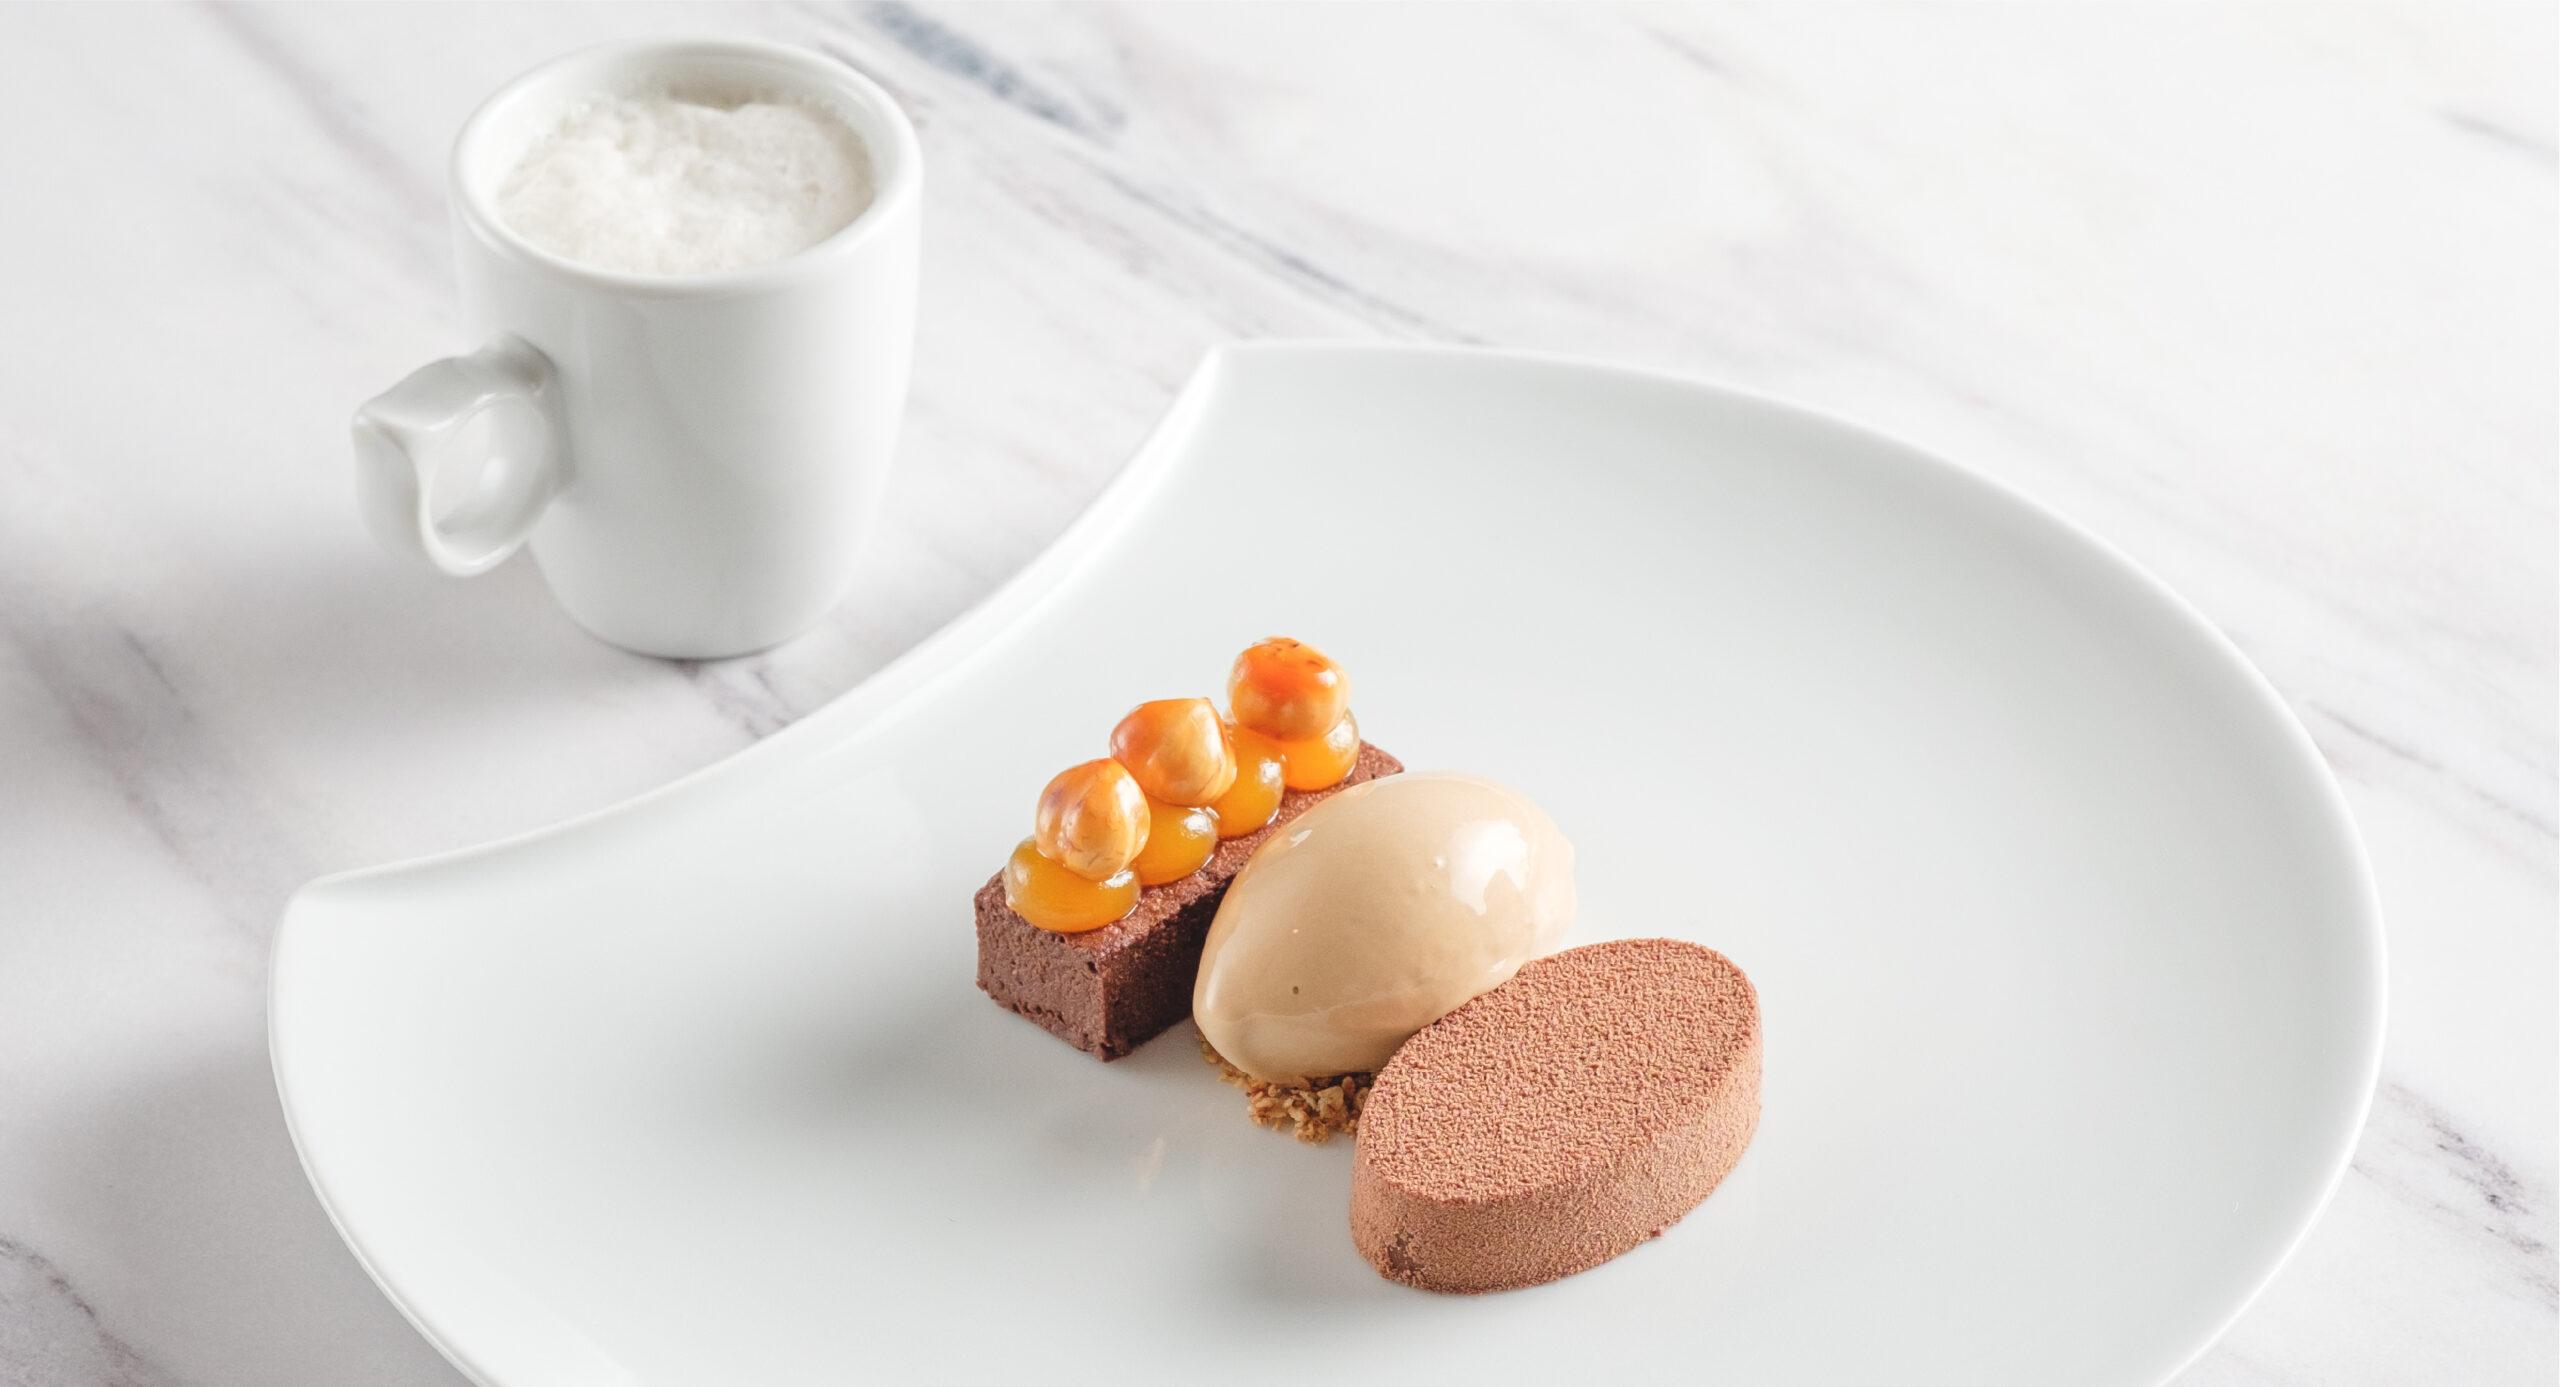 Keller Chocolate